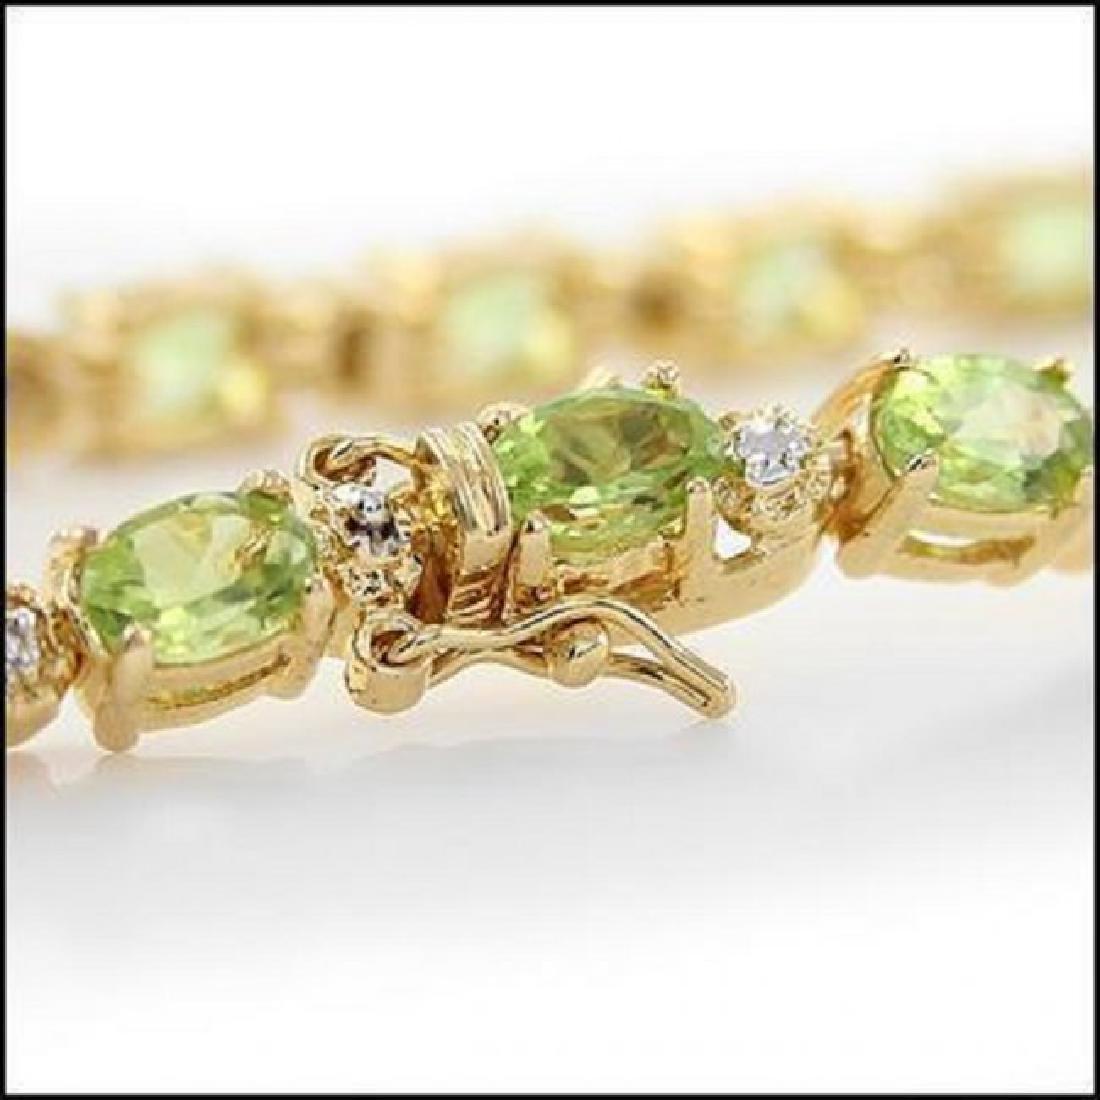 10.66 Ct Peridot & Diamond Fine Bracelet $1335 - 2